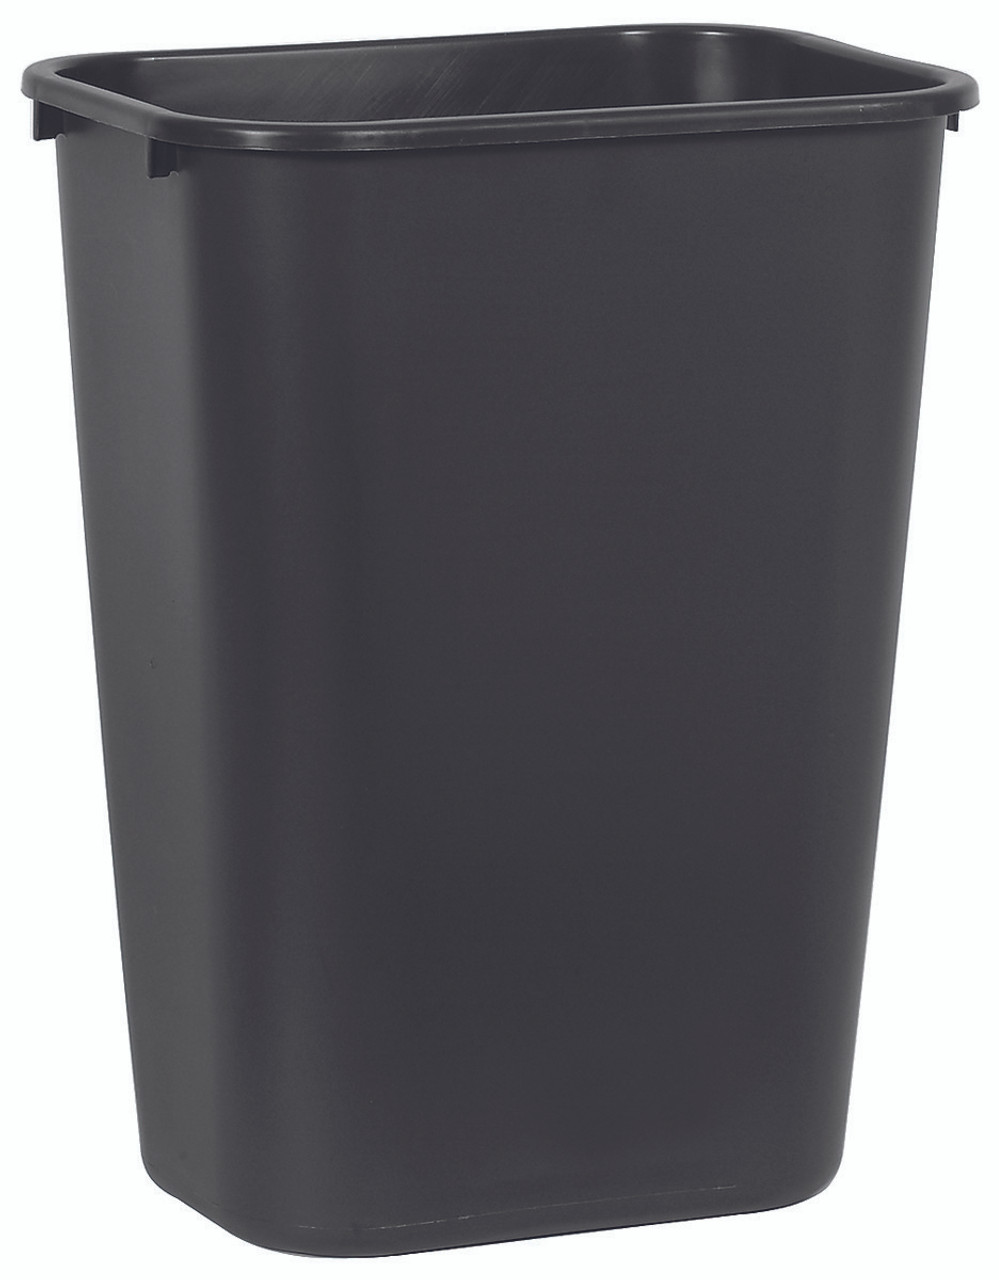 Rubbermaid Rectangular Wastebasket 39 L - Black - FG295700BLA